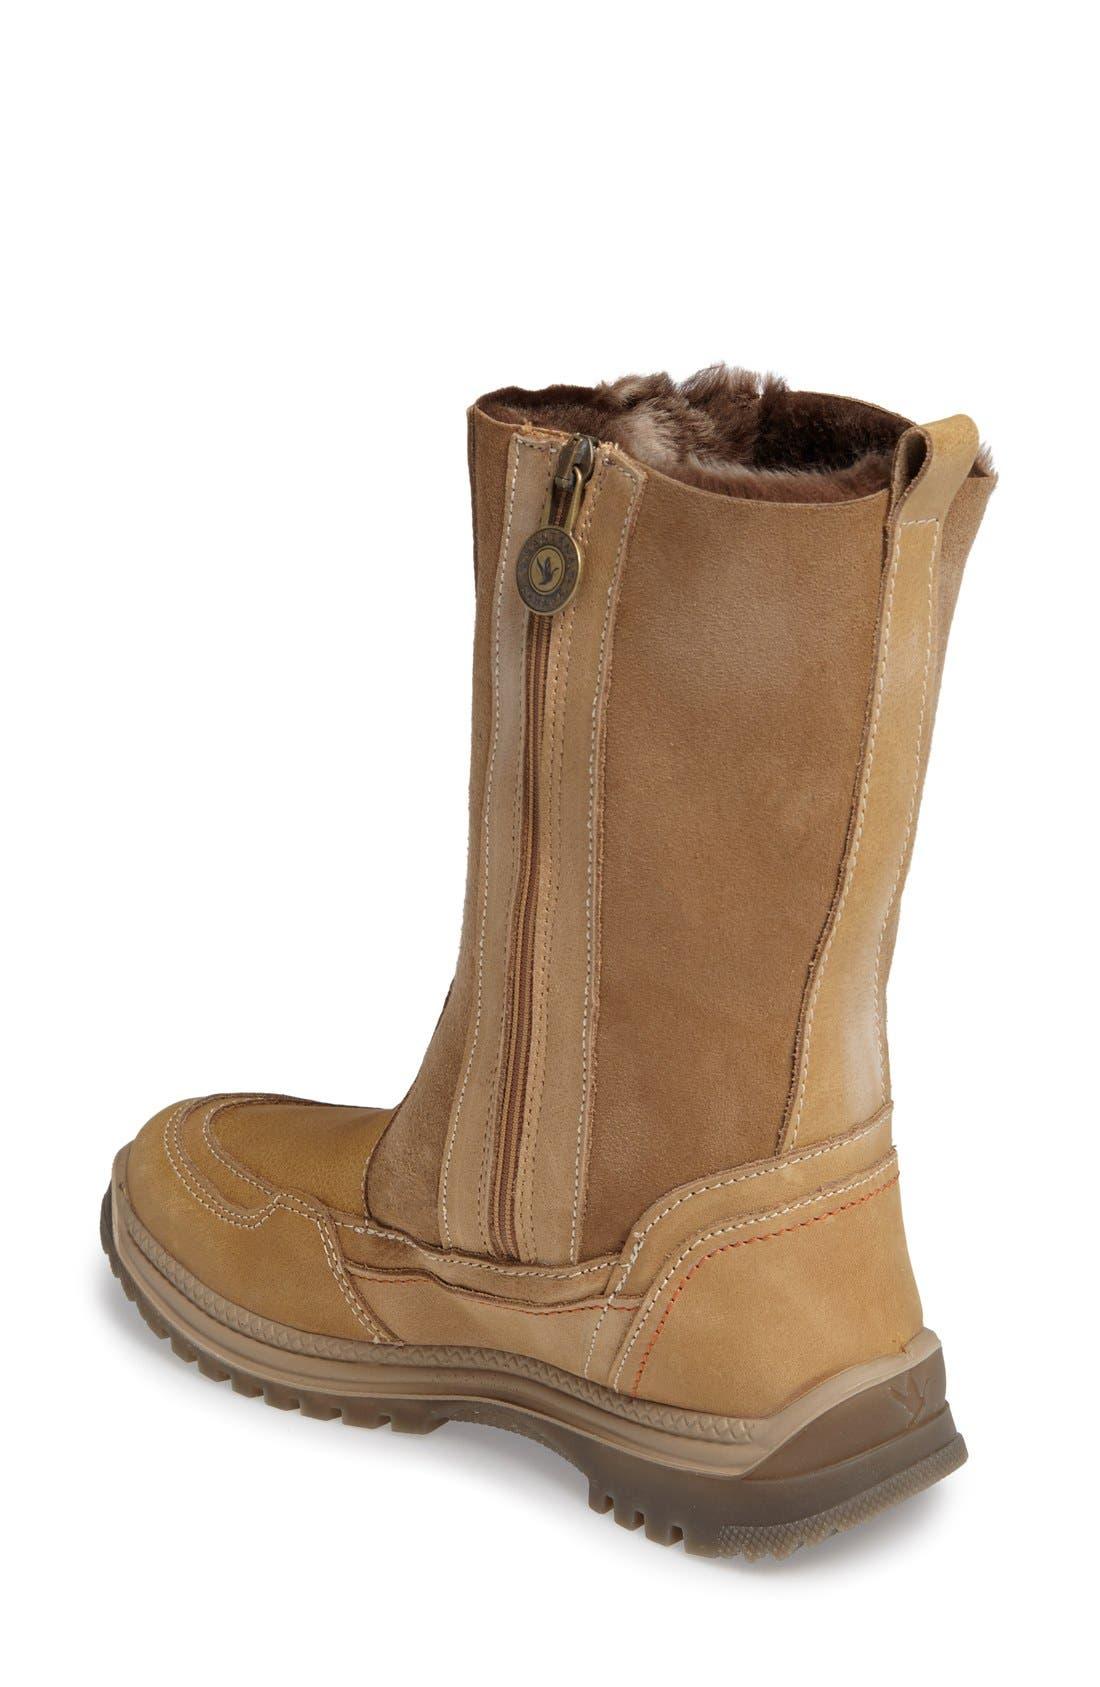 Alternate Image 2  - Santana Canada Seraphine Genuine Shearling Waterproof Winter Boot (Women) (Wide Calf)